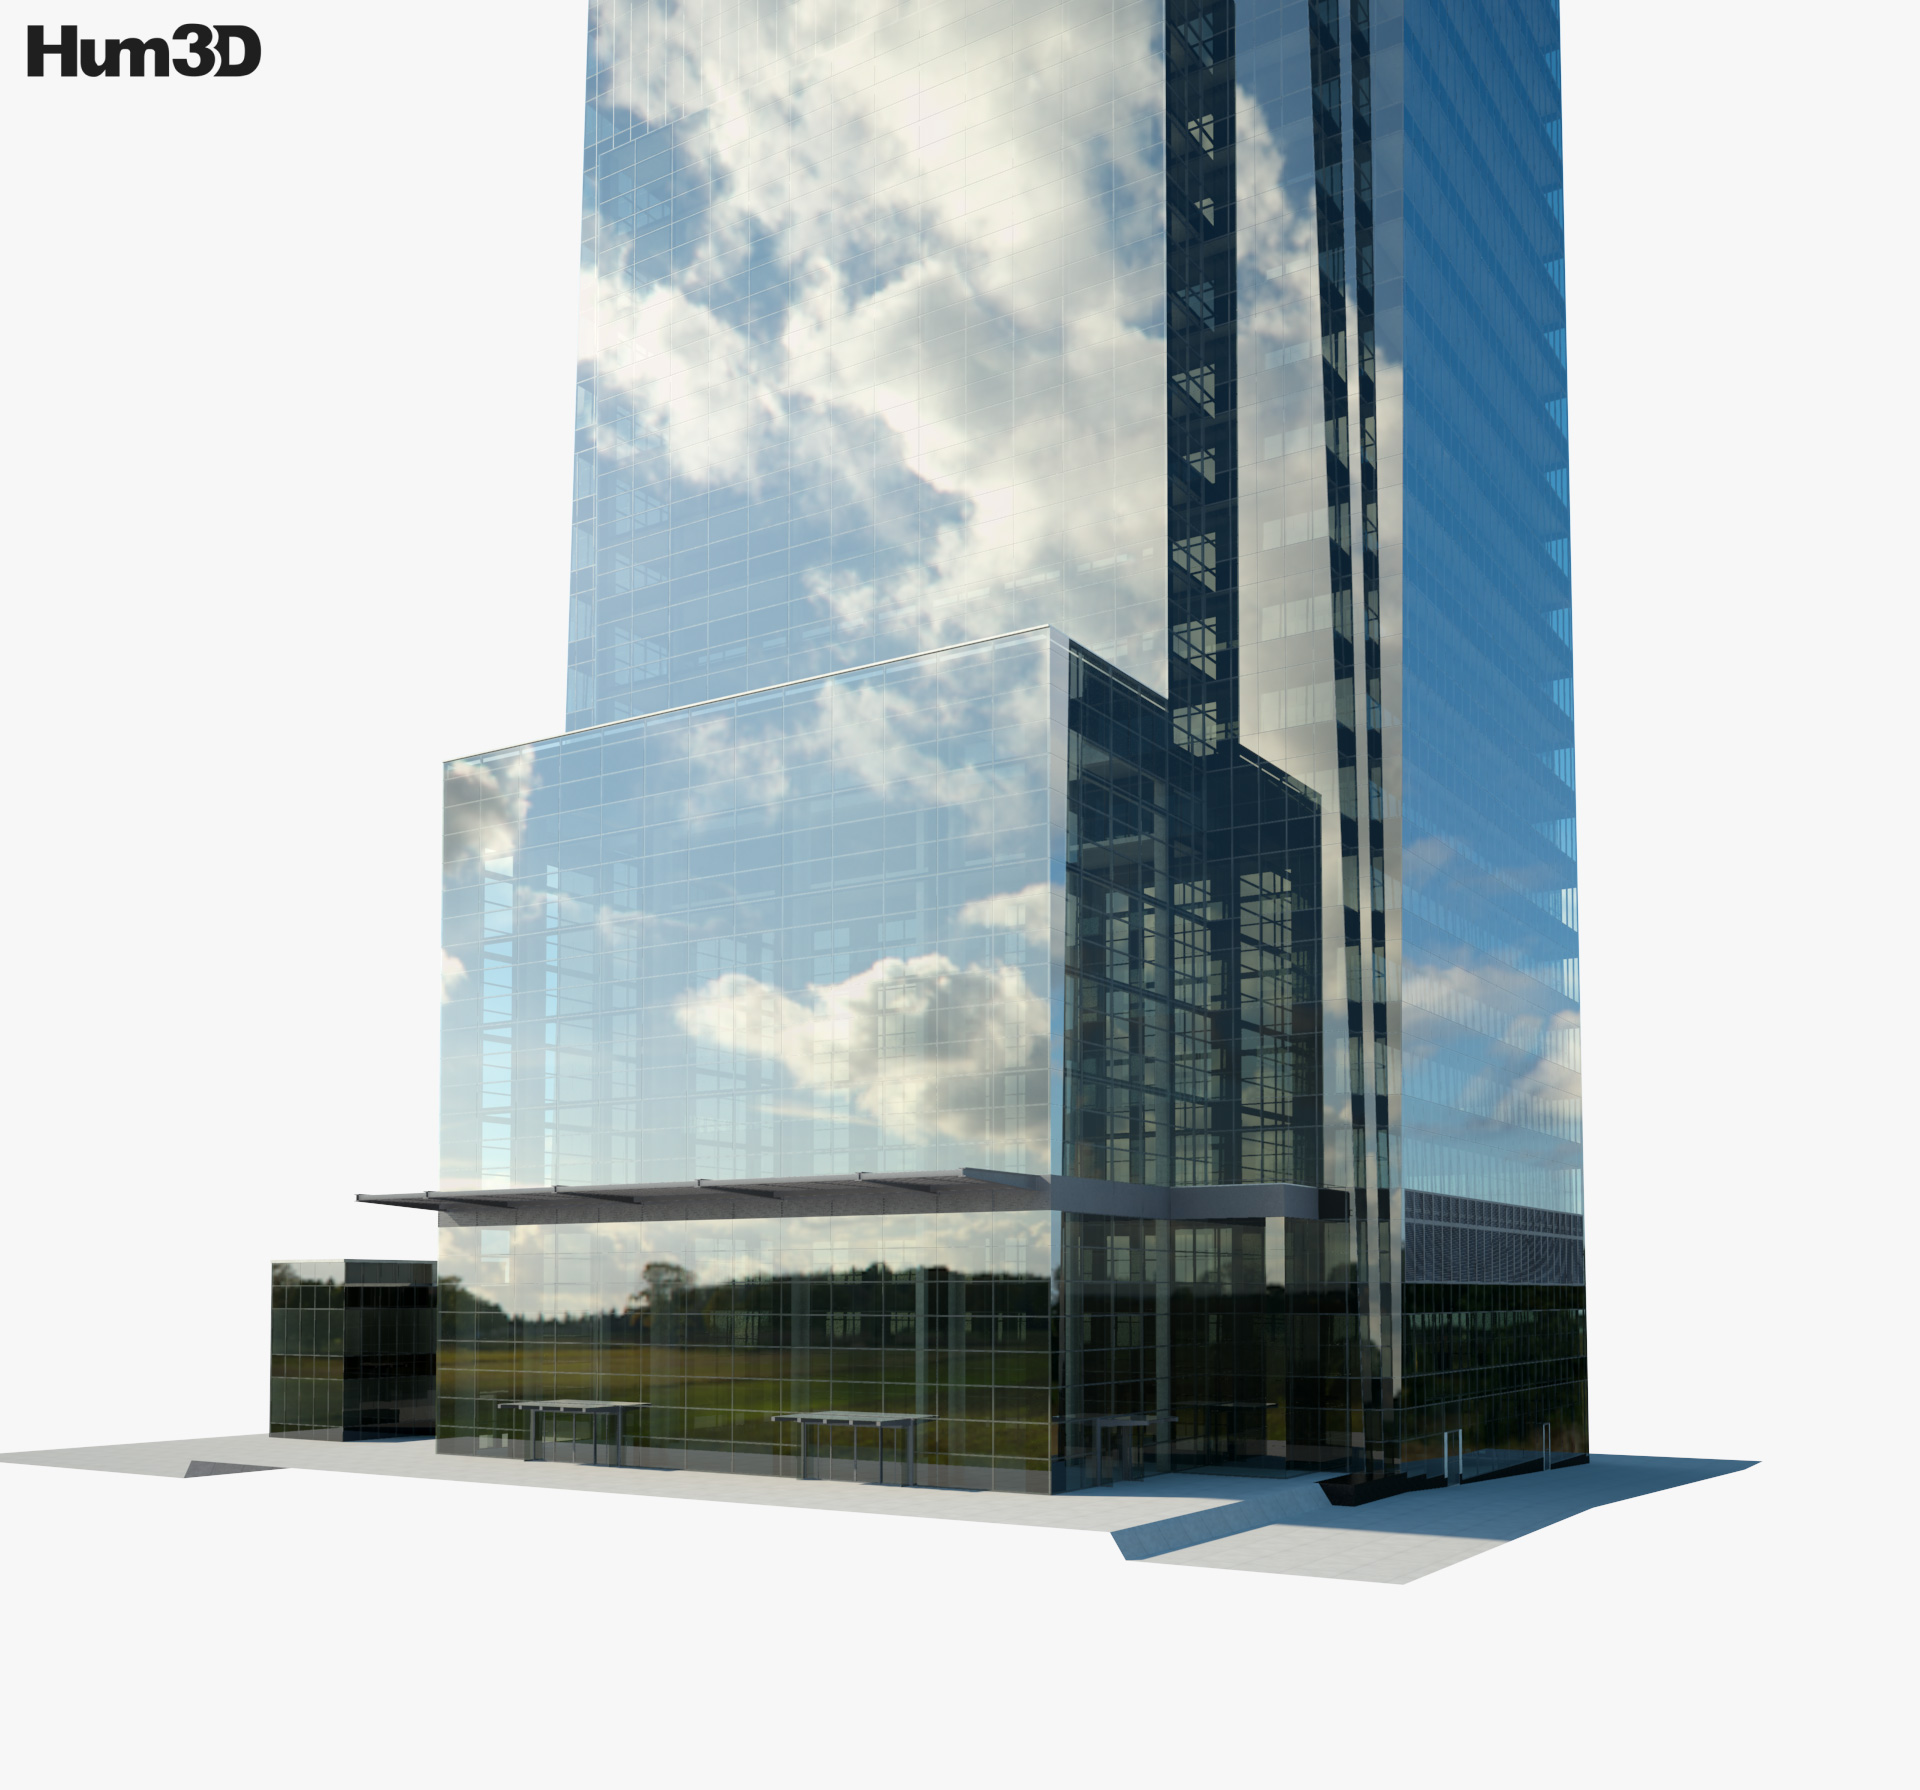 Comcast Center 3d model